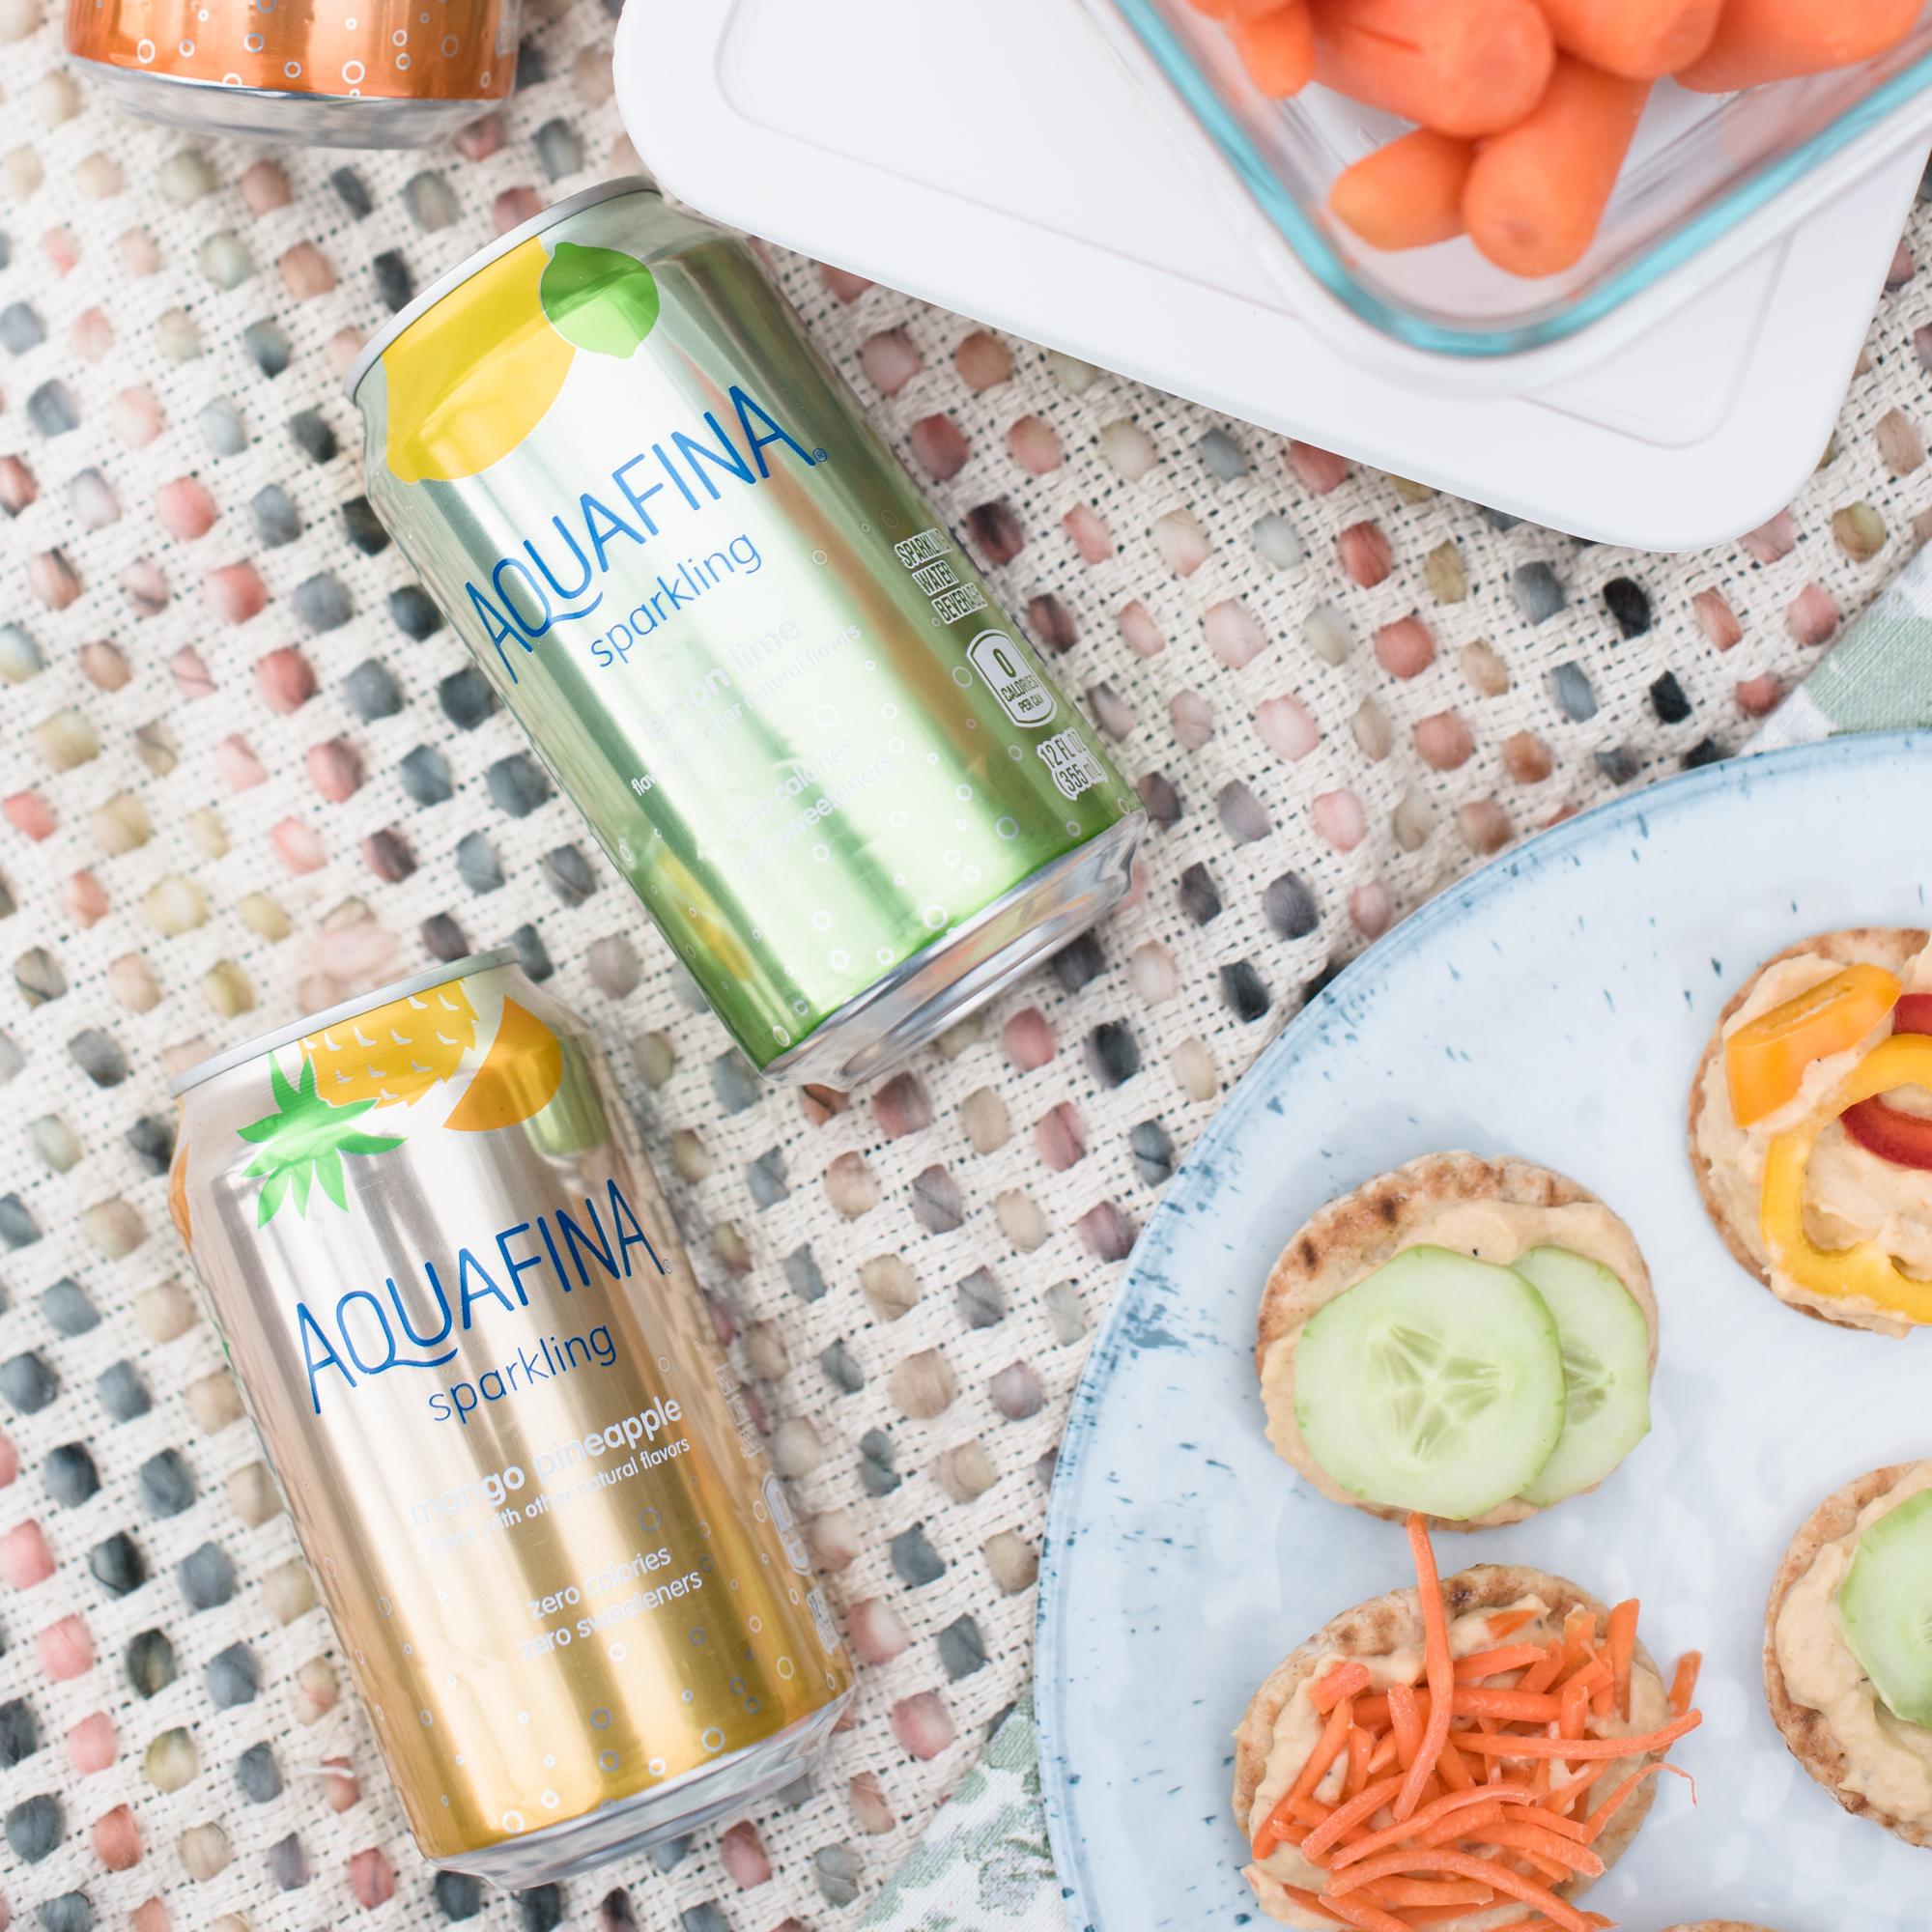 Aquafina Sparkling Water and Healthy Hummus & Veggie Pitas via @missmollymoon